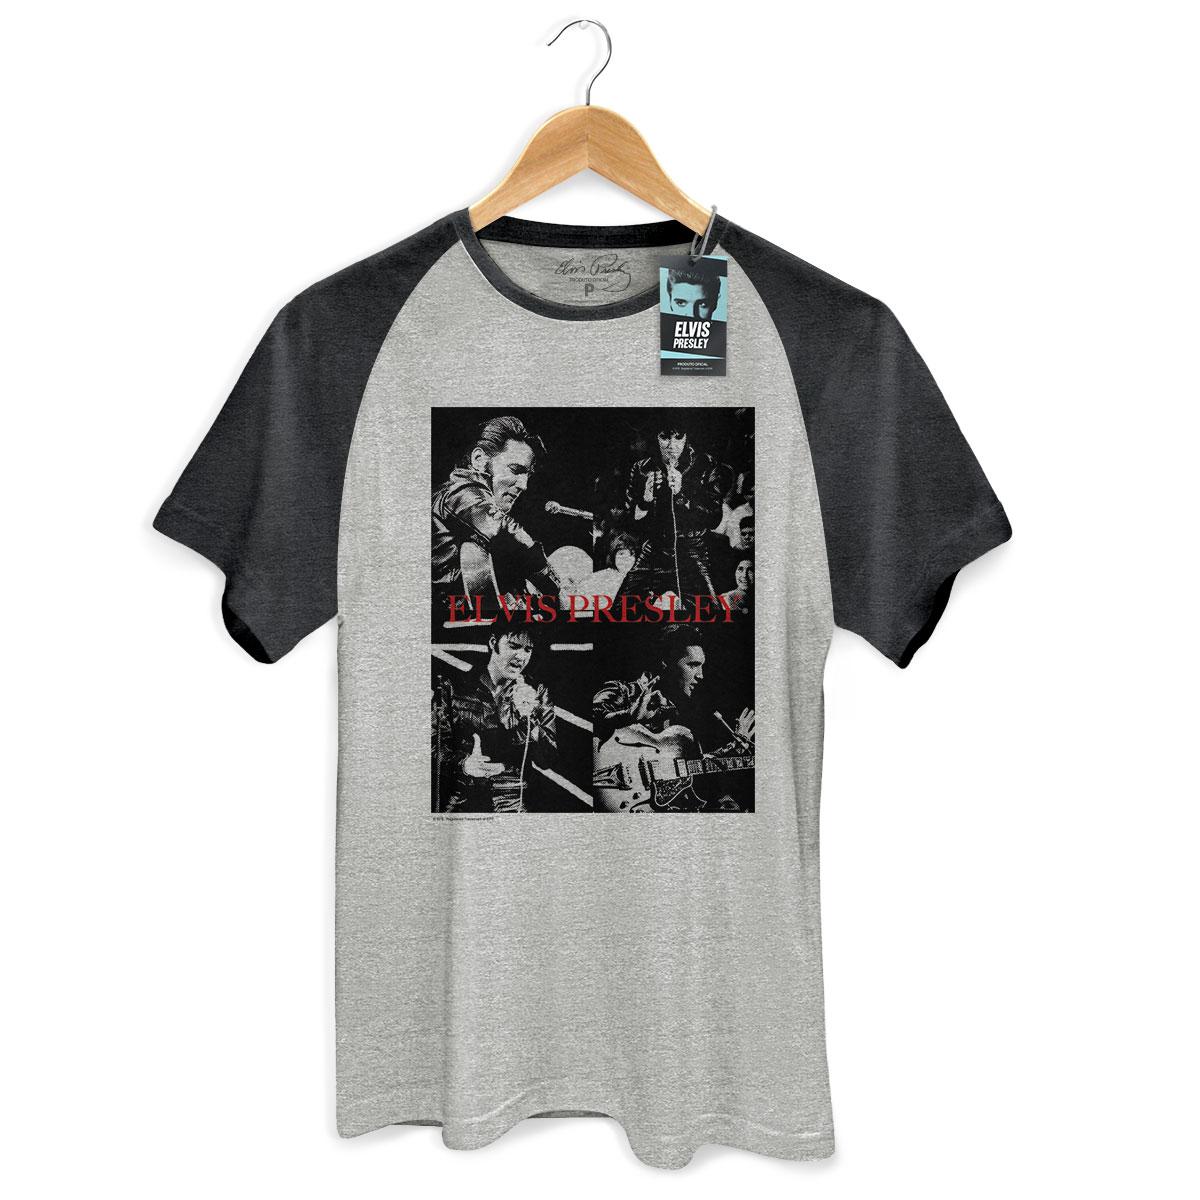 Camiseta Raglan Premium Masculina Elvis Presley 68 Pics